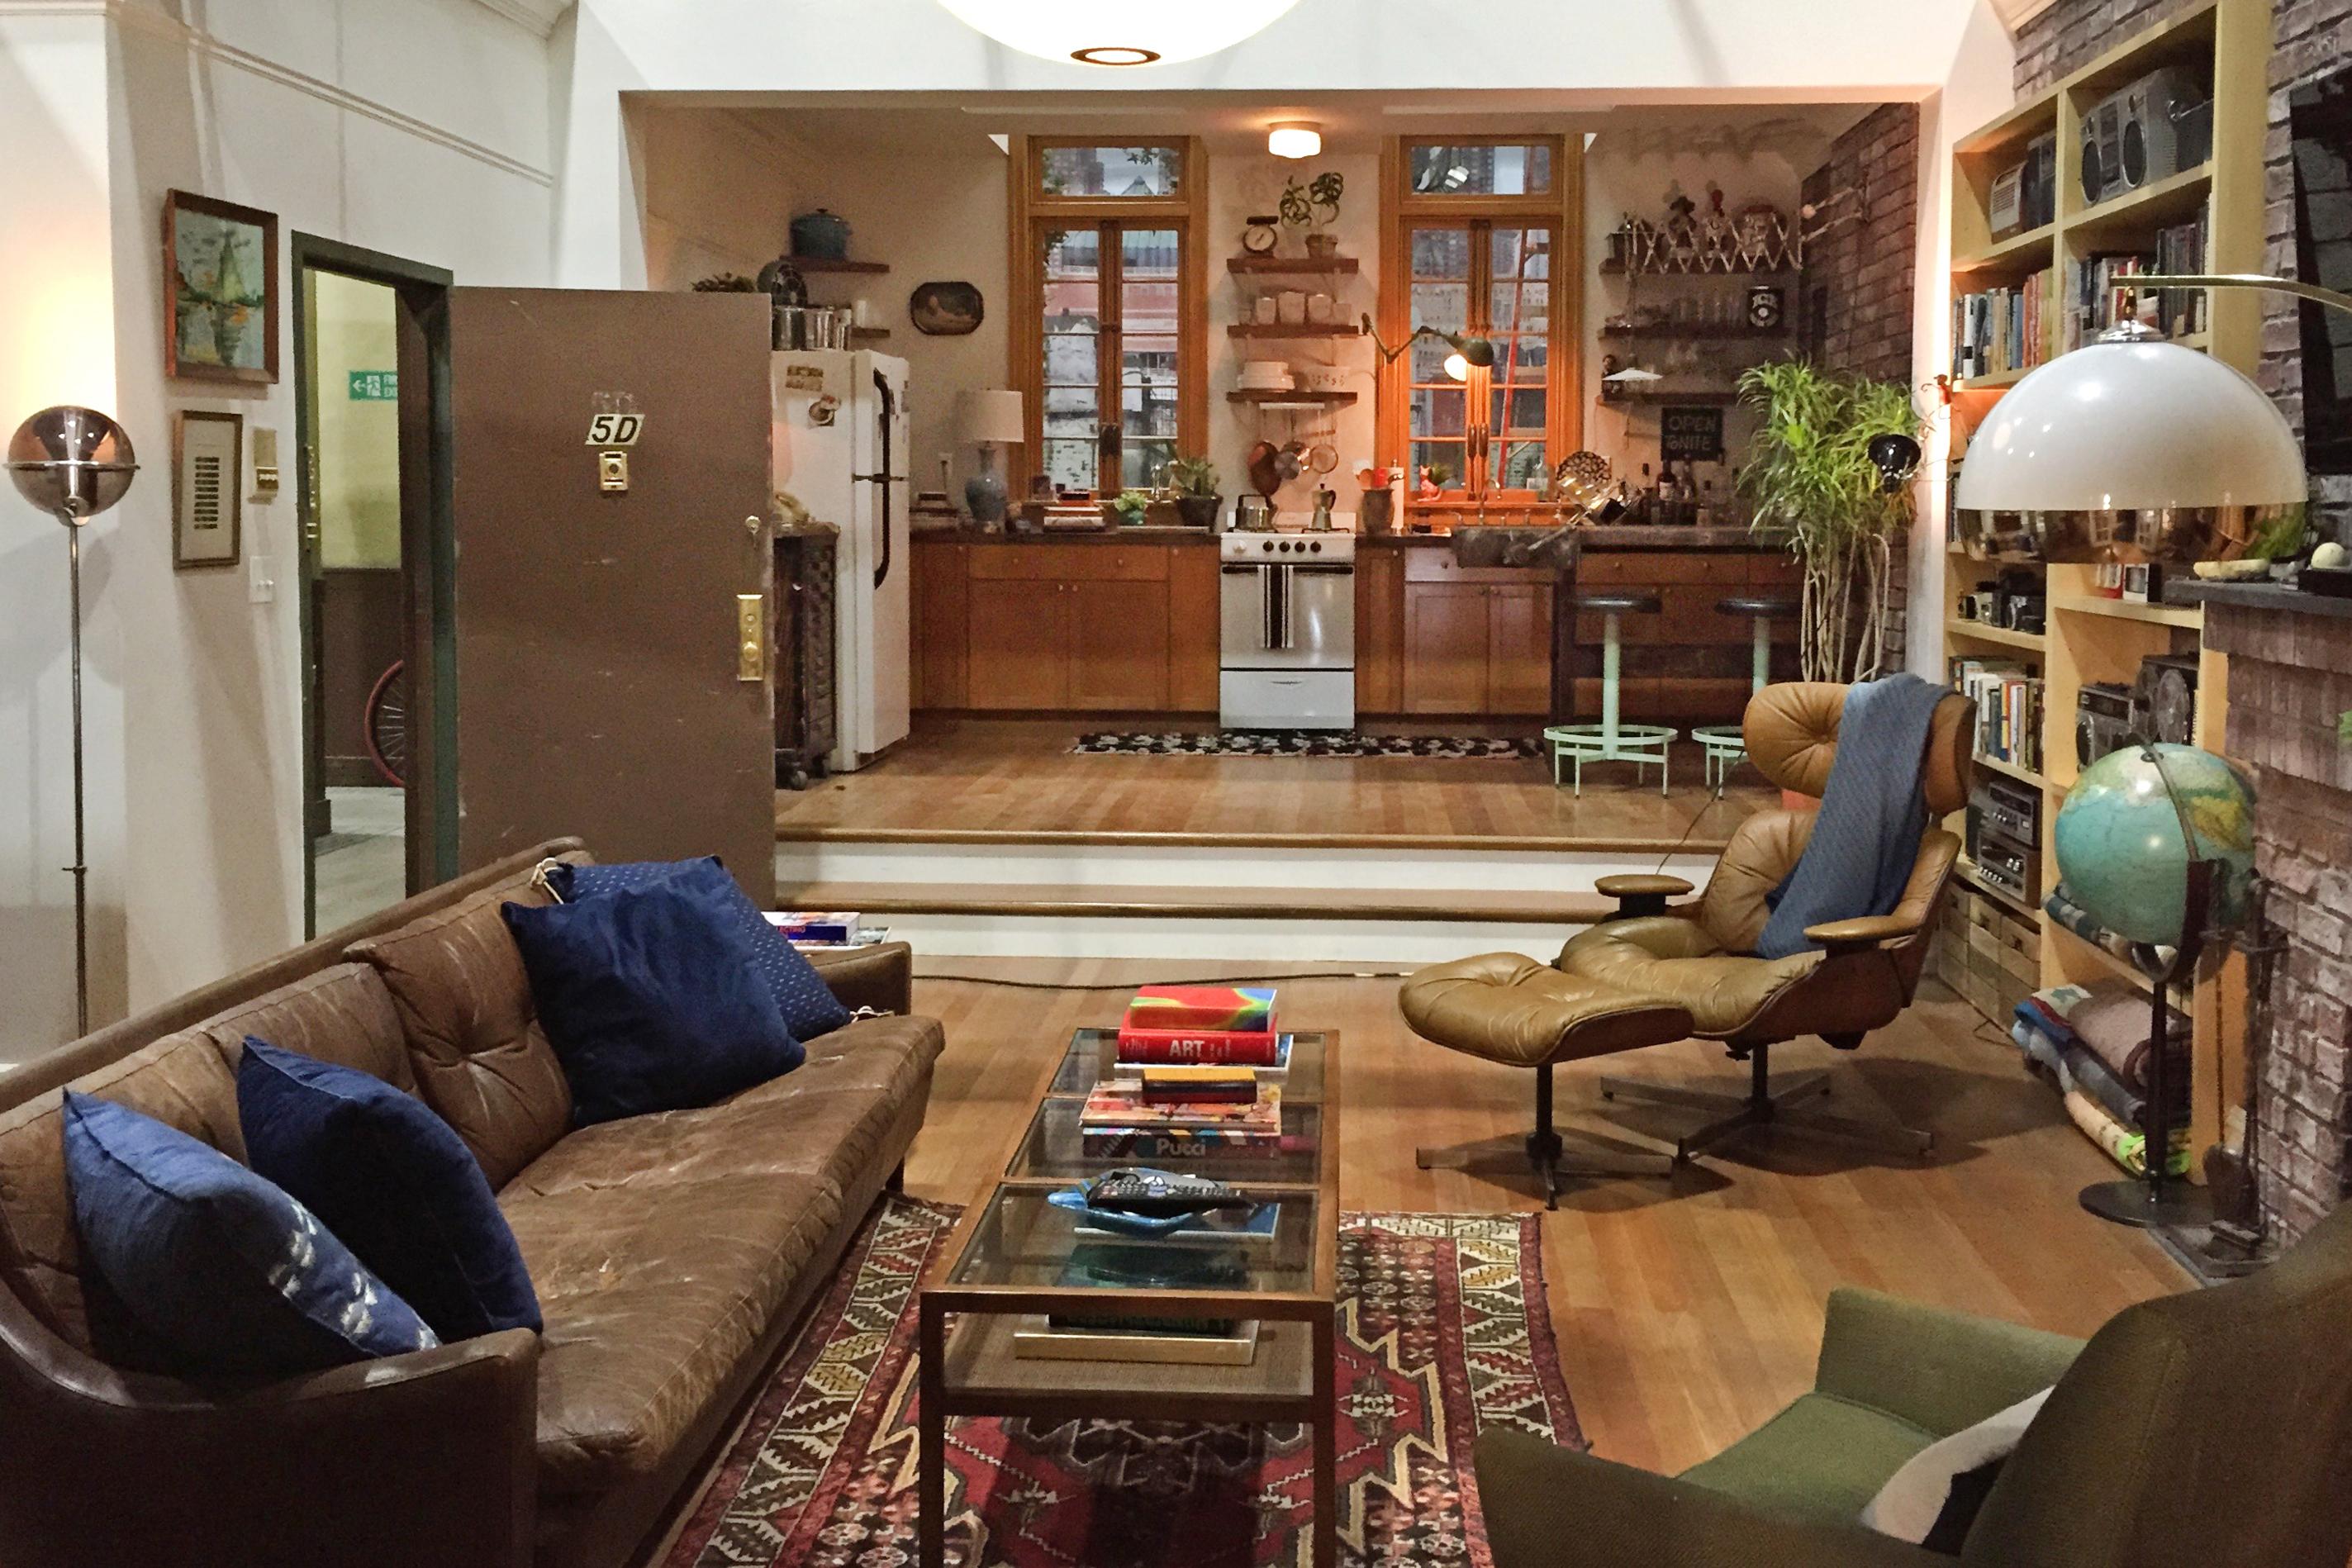 Master Of None Apartment Set Tour Apartment Therapy